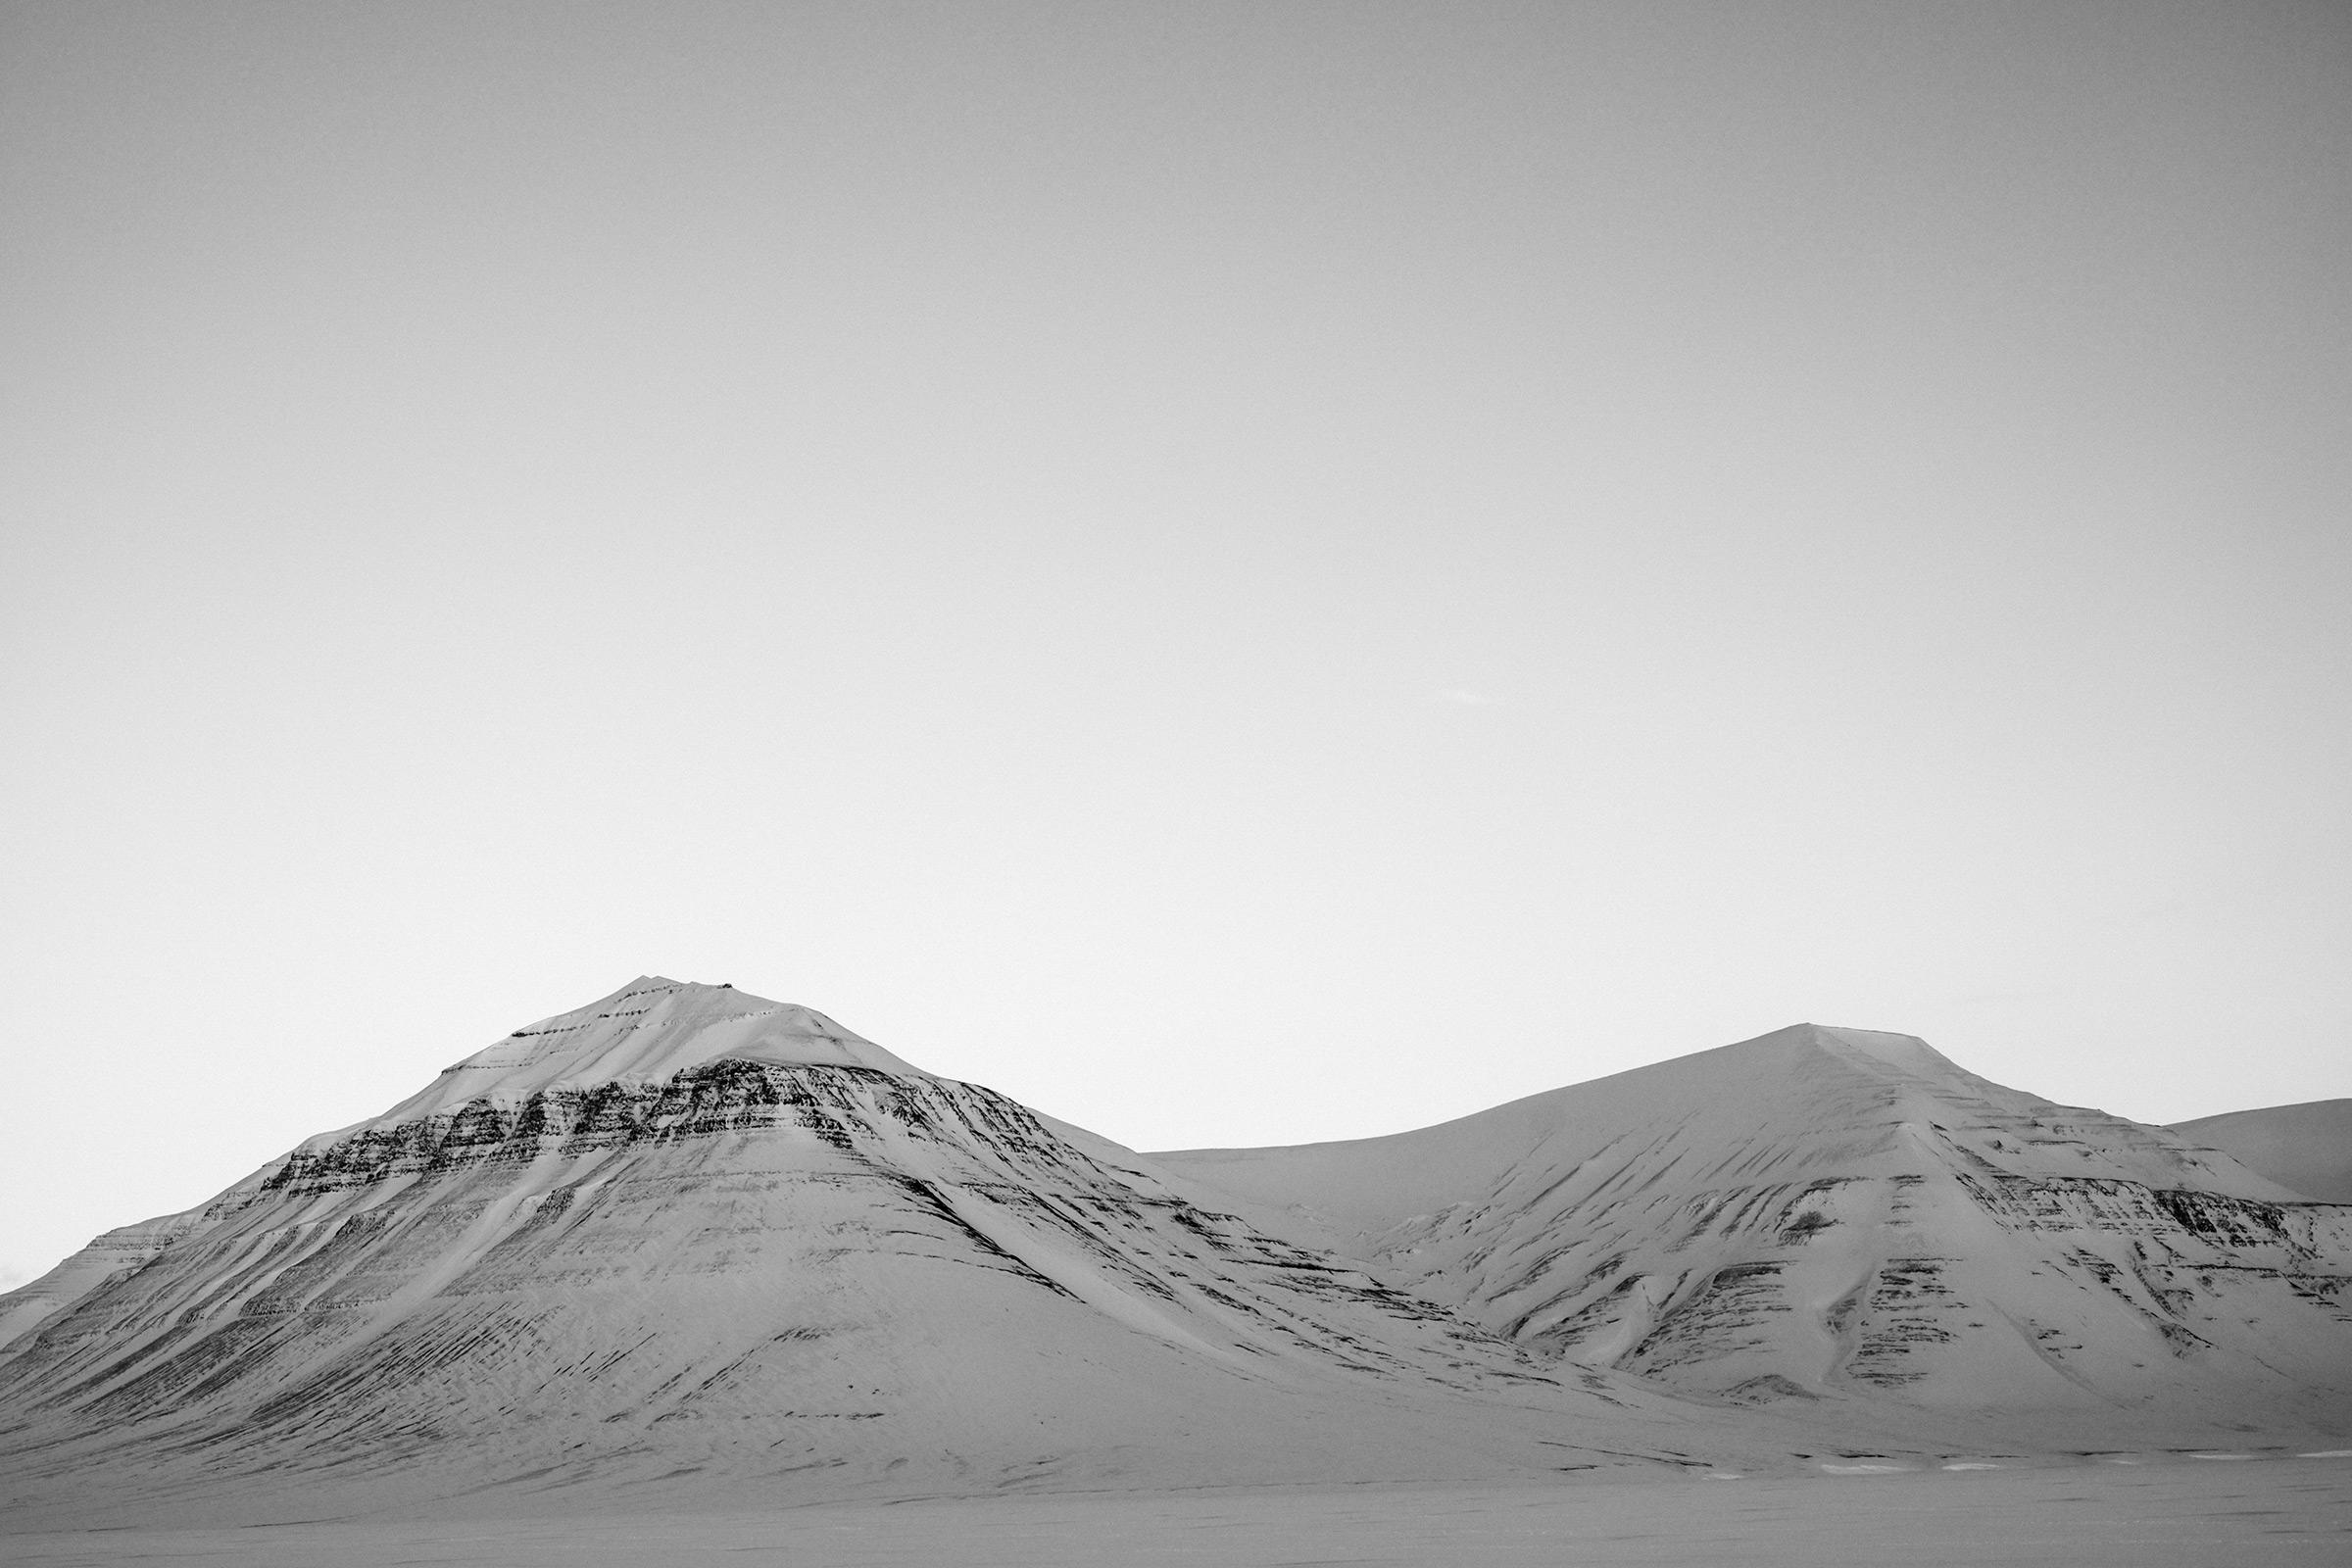 Milne Edwardsfjellet, Svalbard, Foto: Martin Hülle